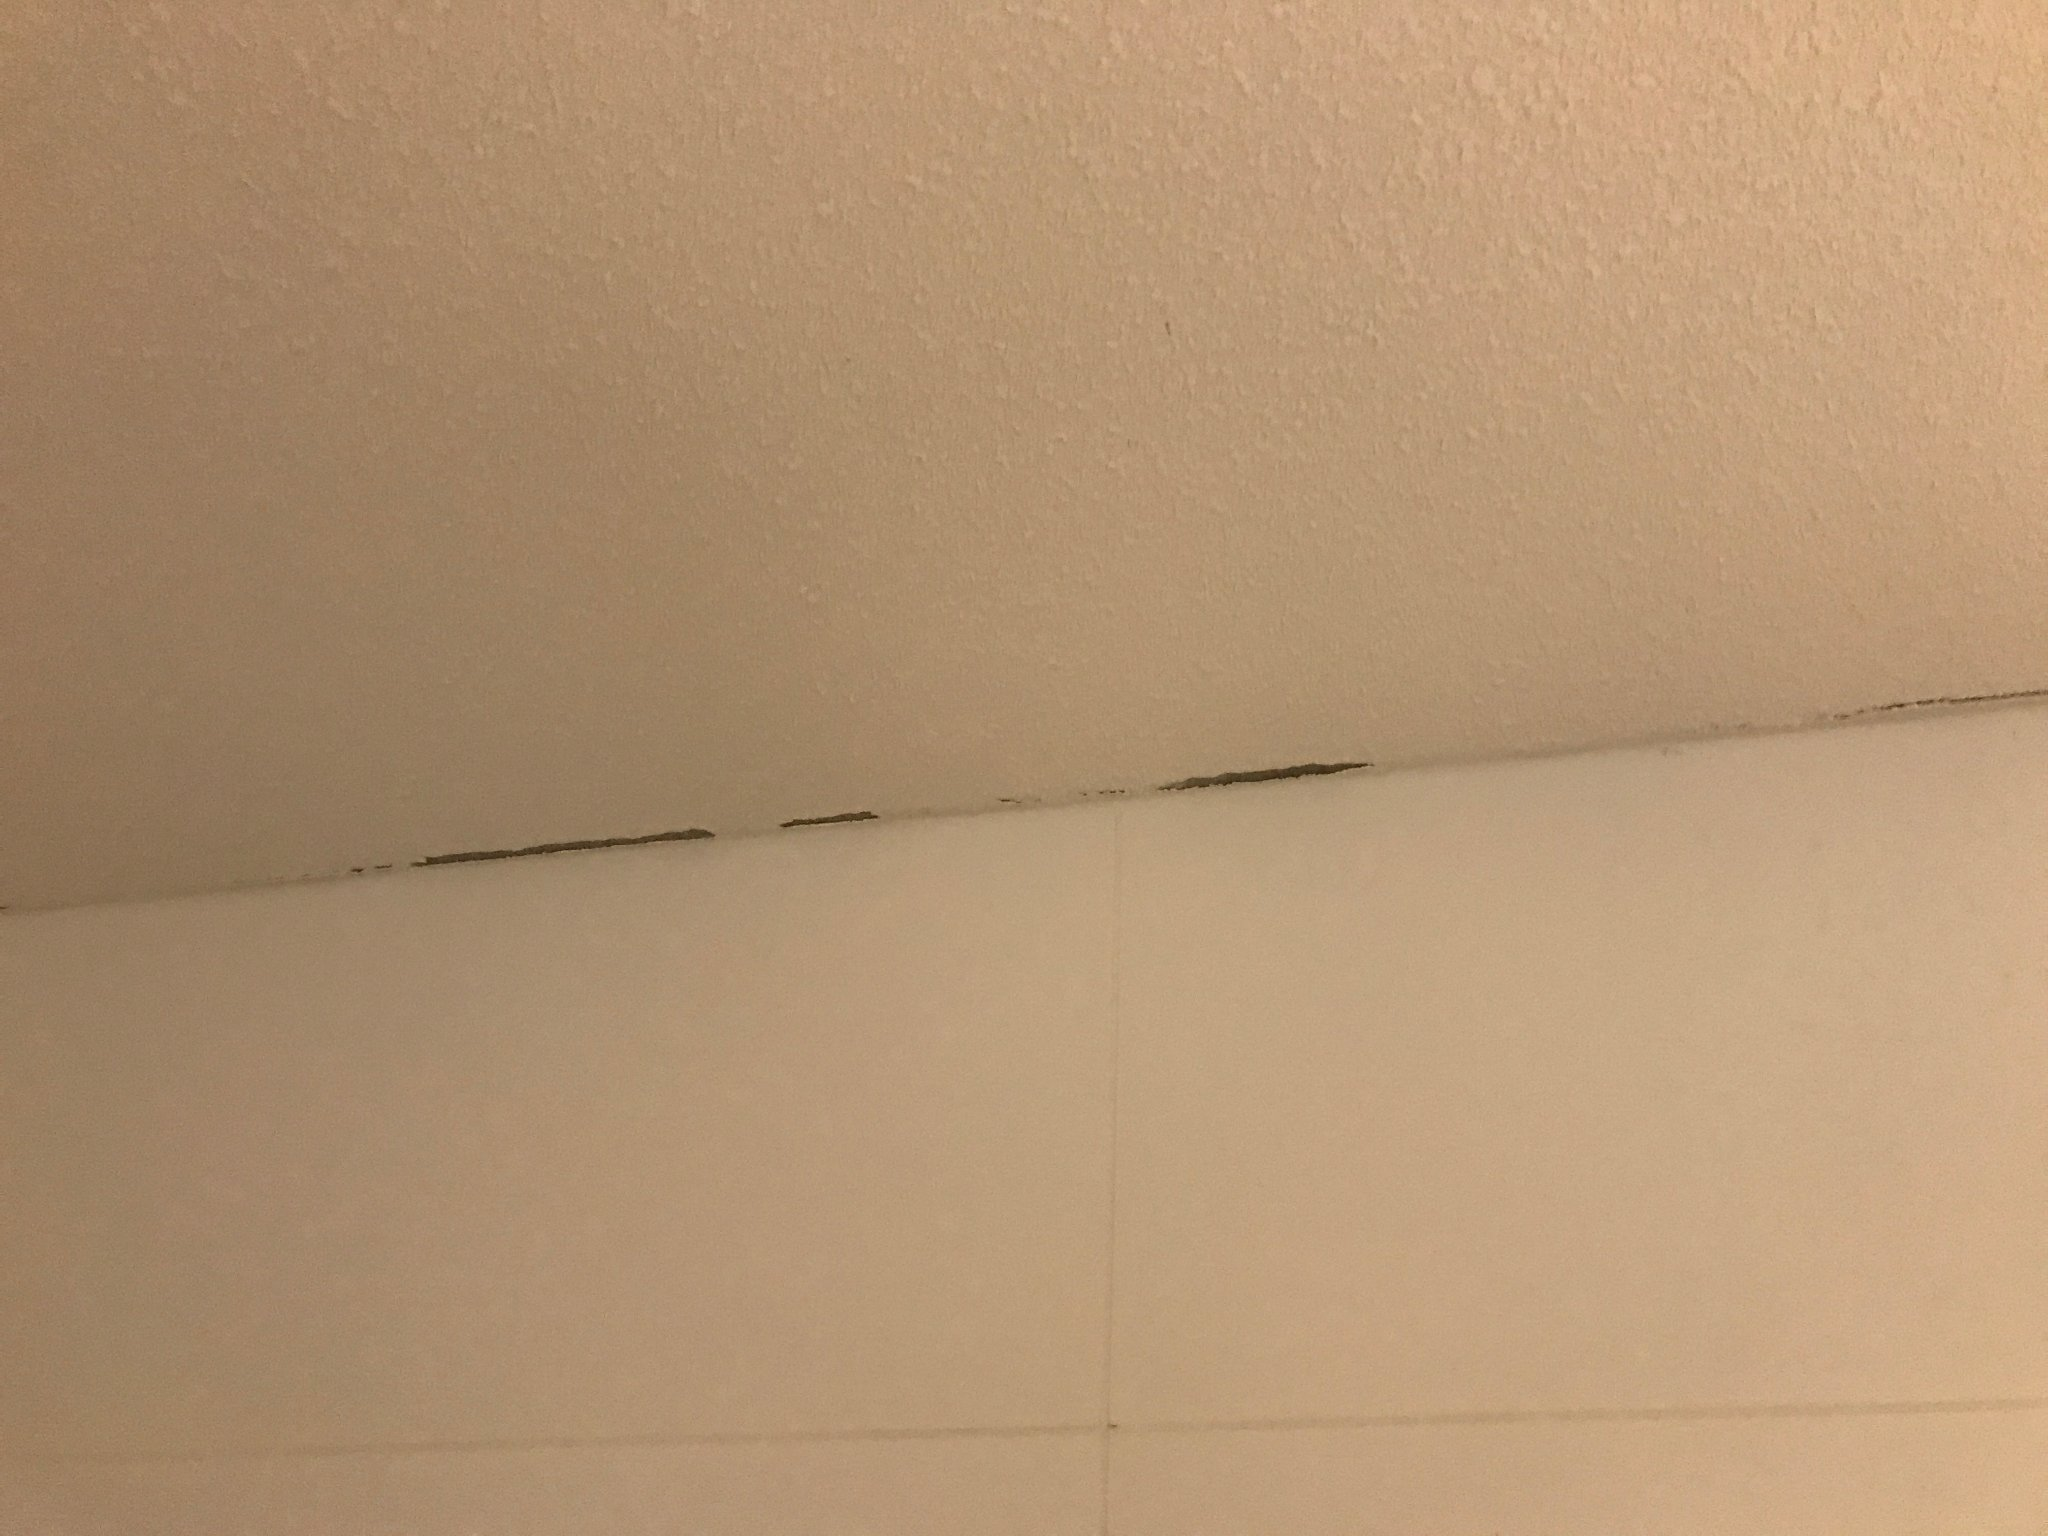 Afkitten plafondrand badkamer zijkant trappen naar 4e en 5e